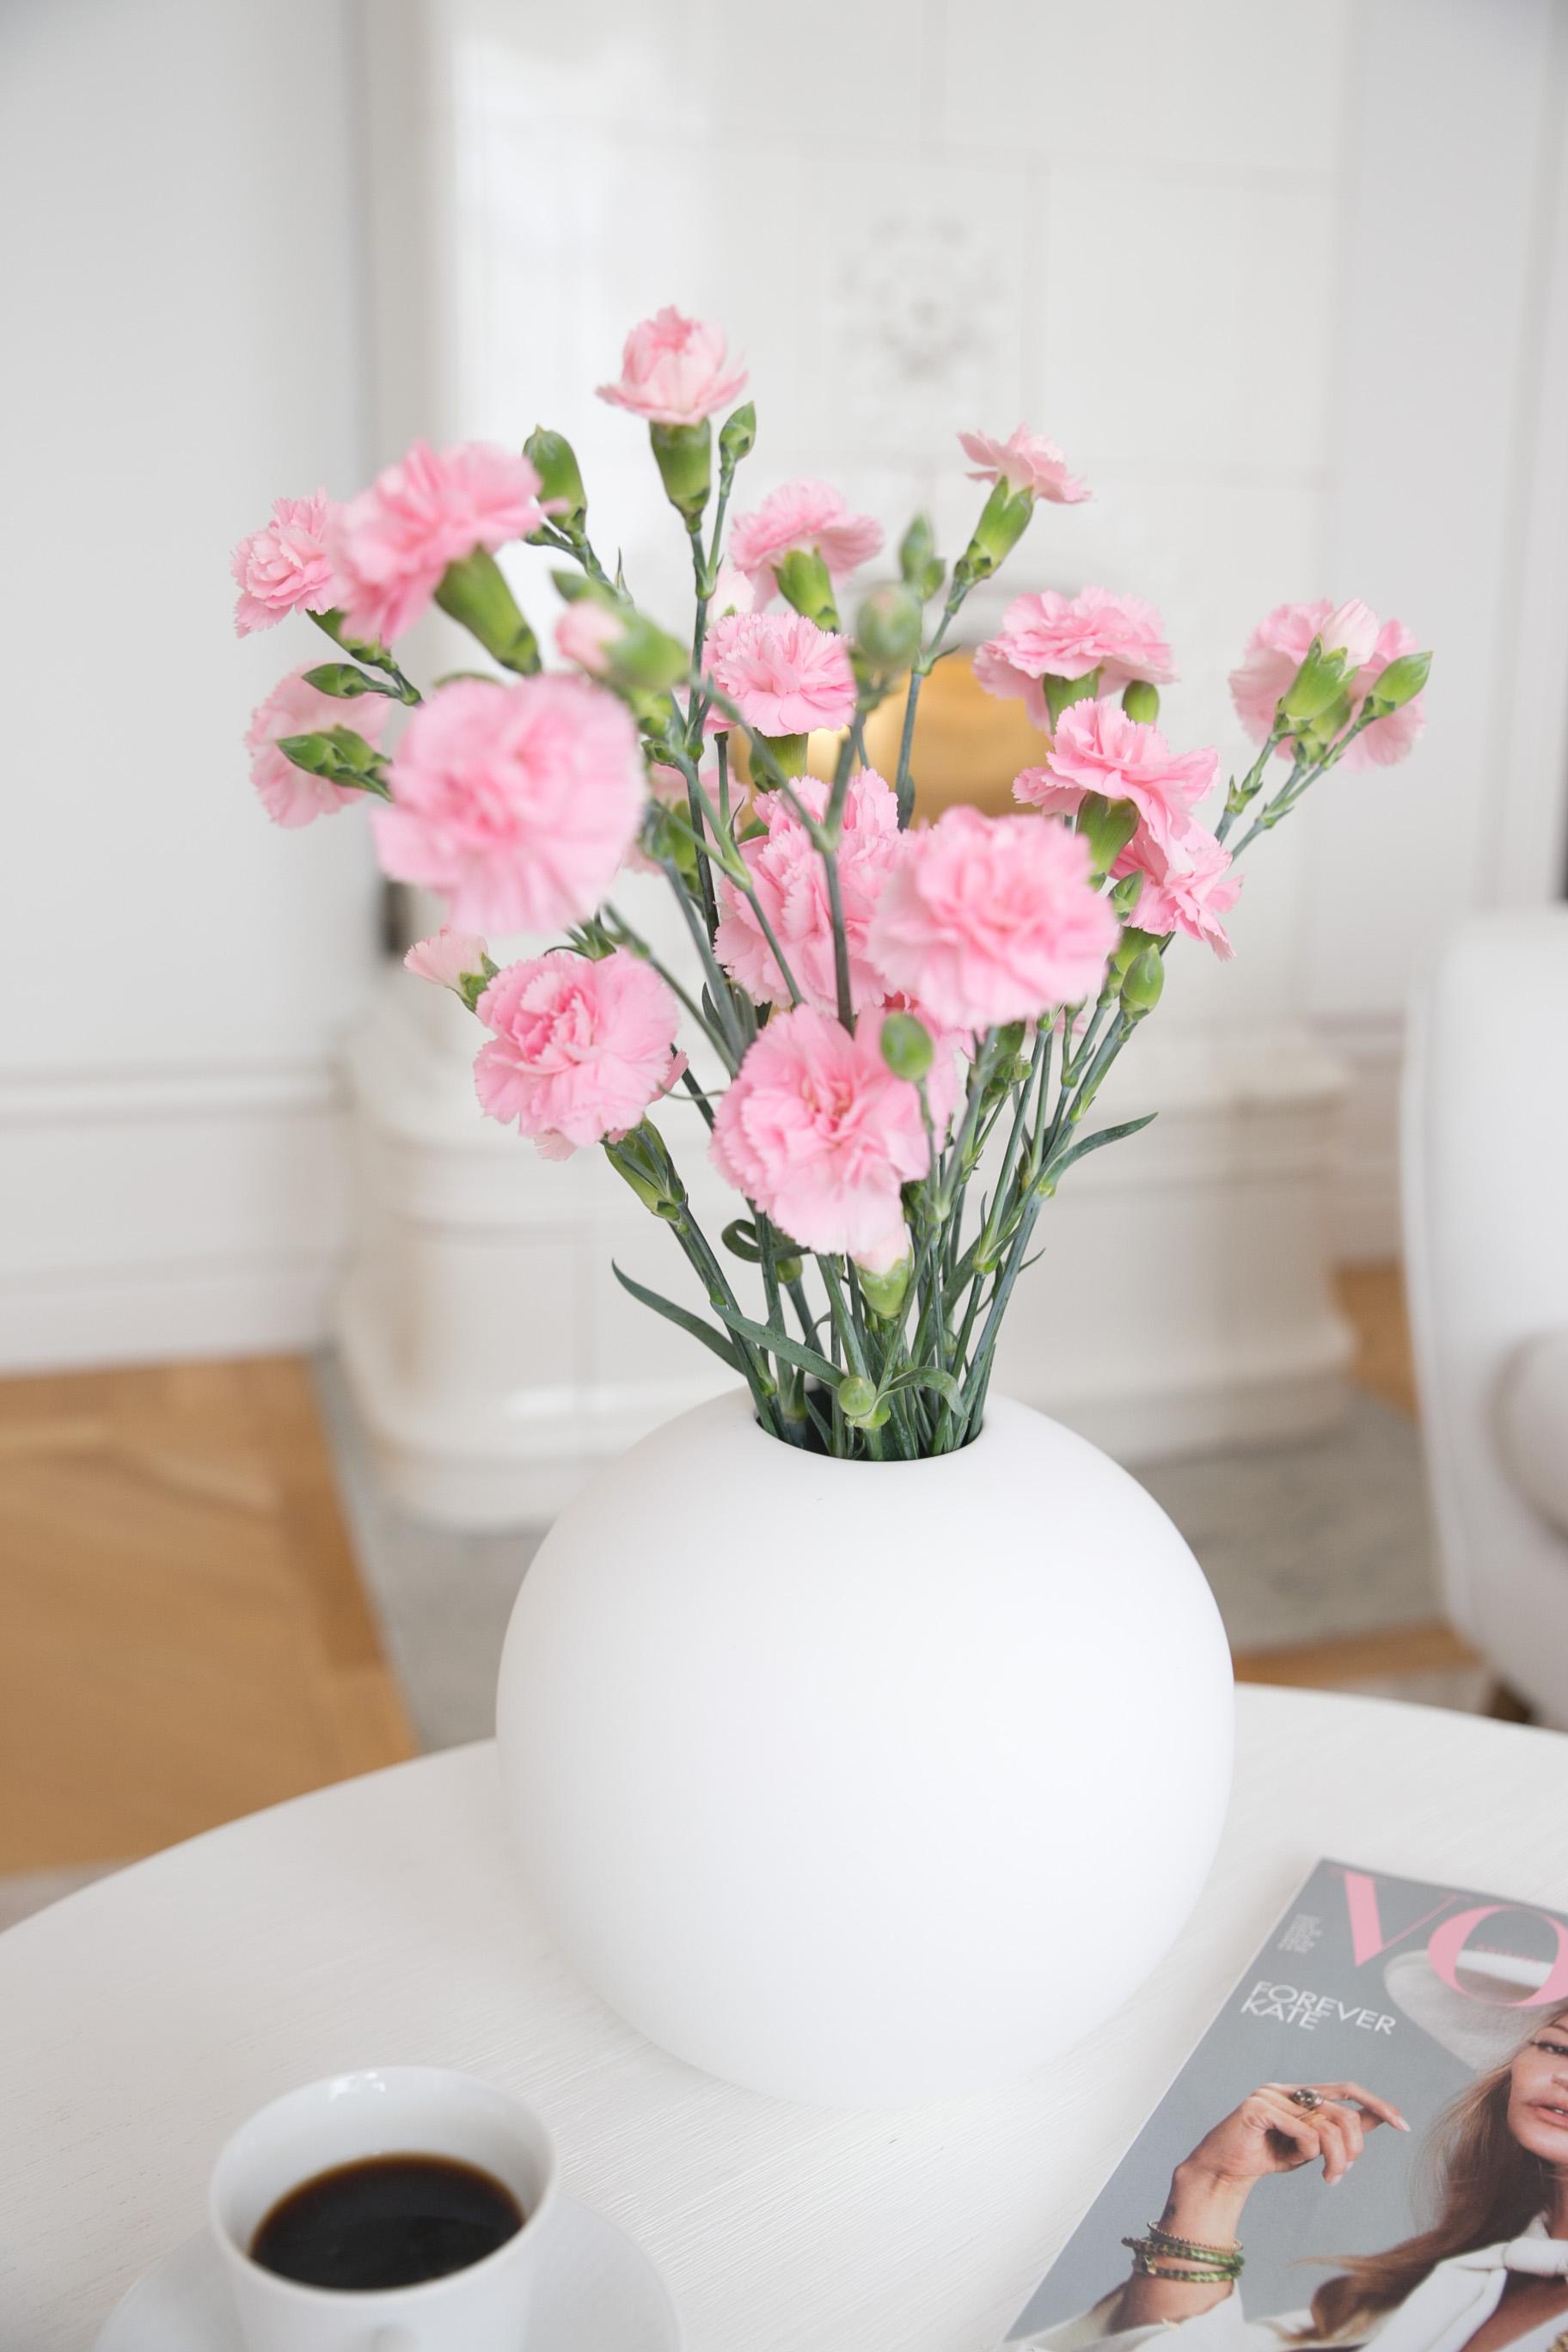 cooee design blommor vardagsrum inredning.jpg